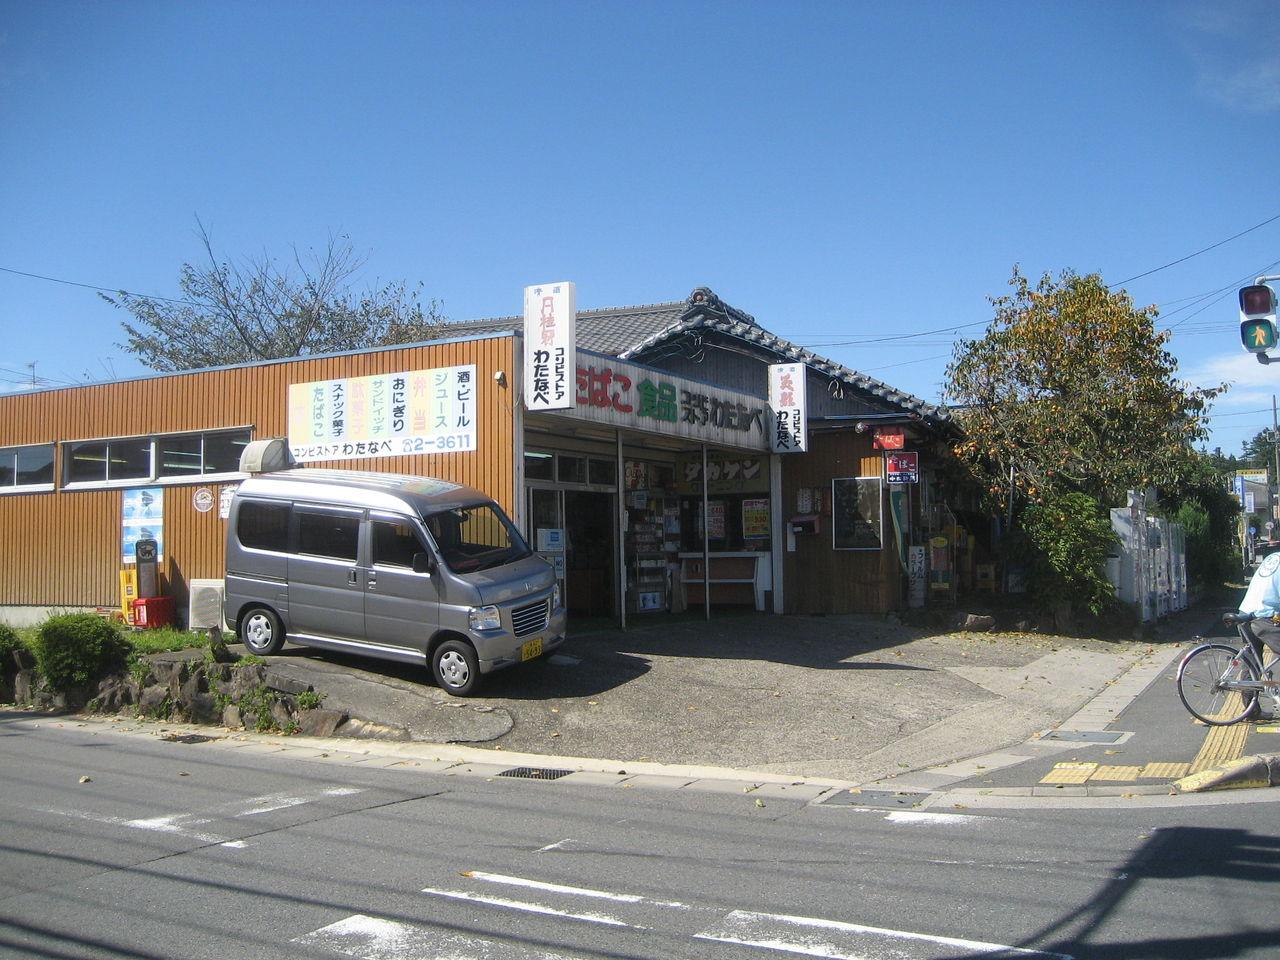 亀山宿~四日市宿 | 不妊|漢方|鍼灸|大阪|卵子の質改善|不妊専門の三ツ川レディース漢方鍼灸院